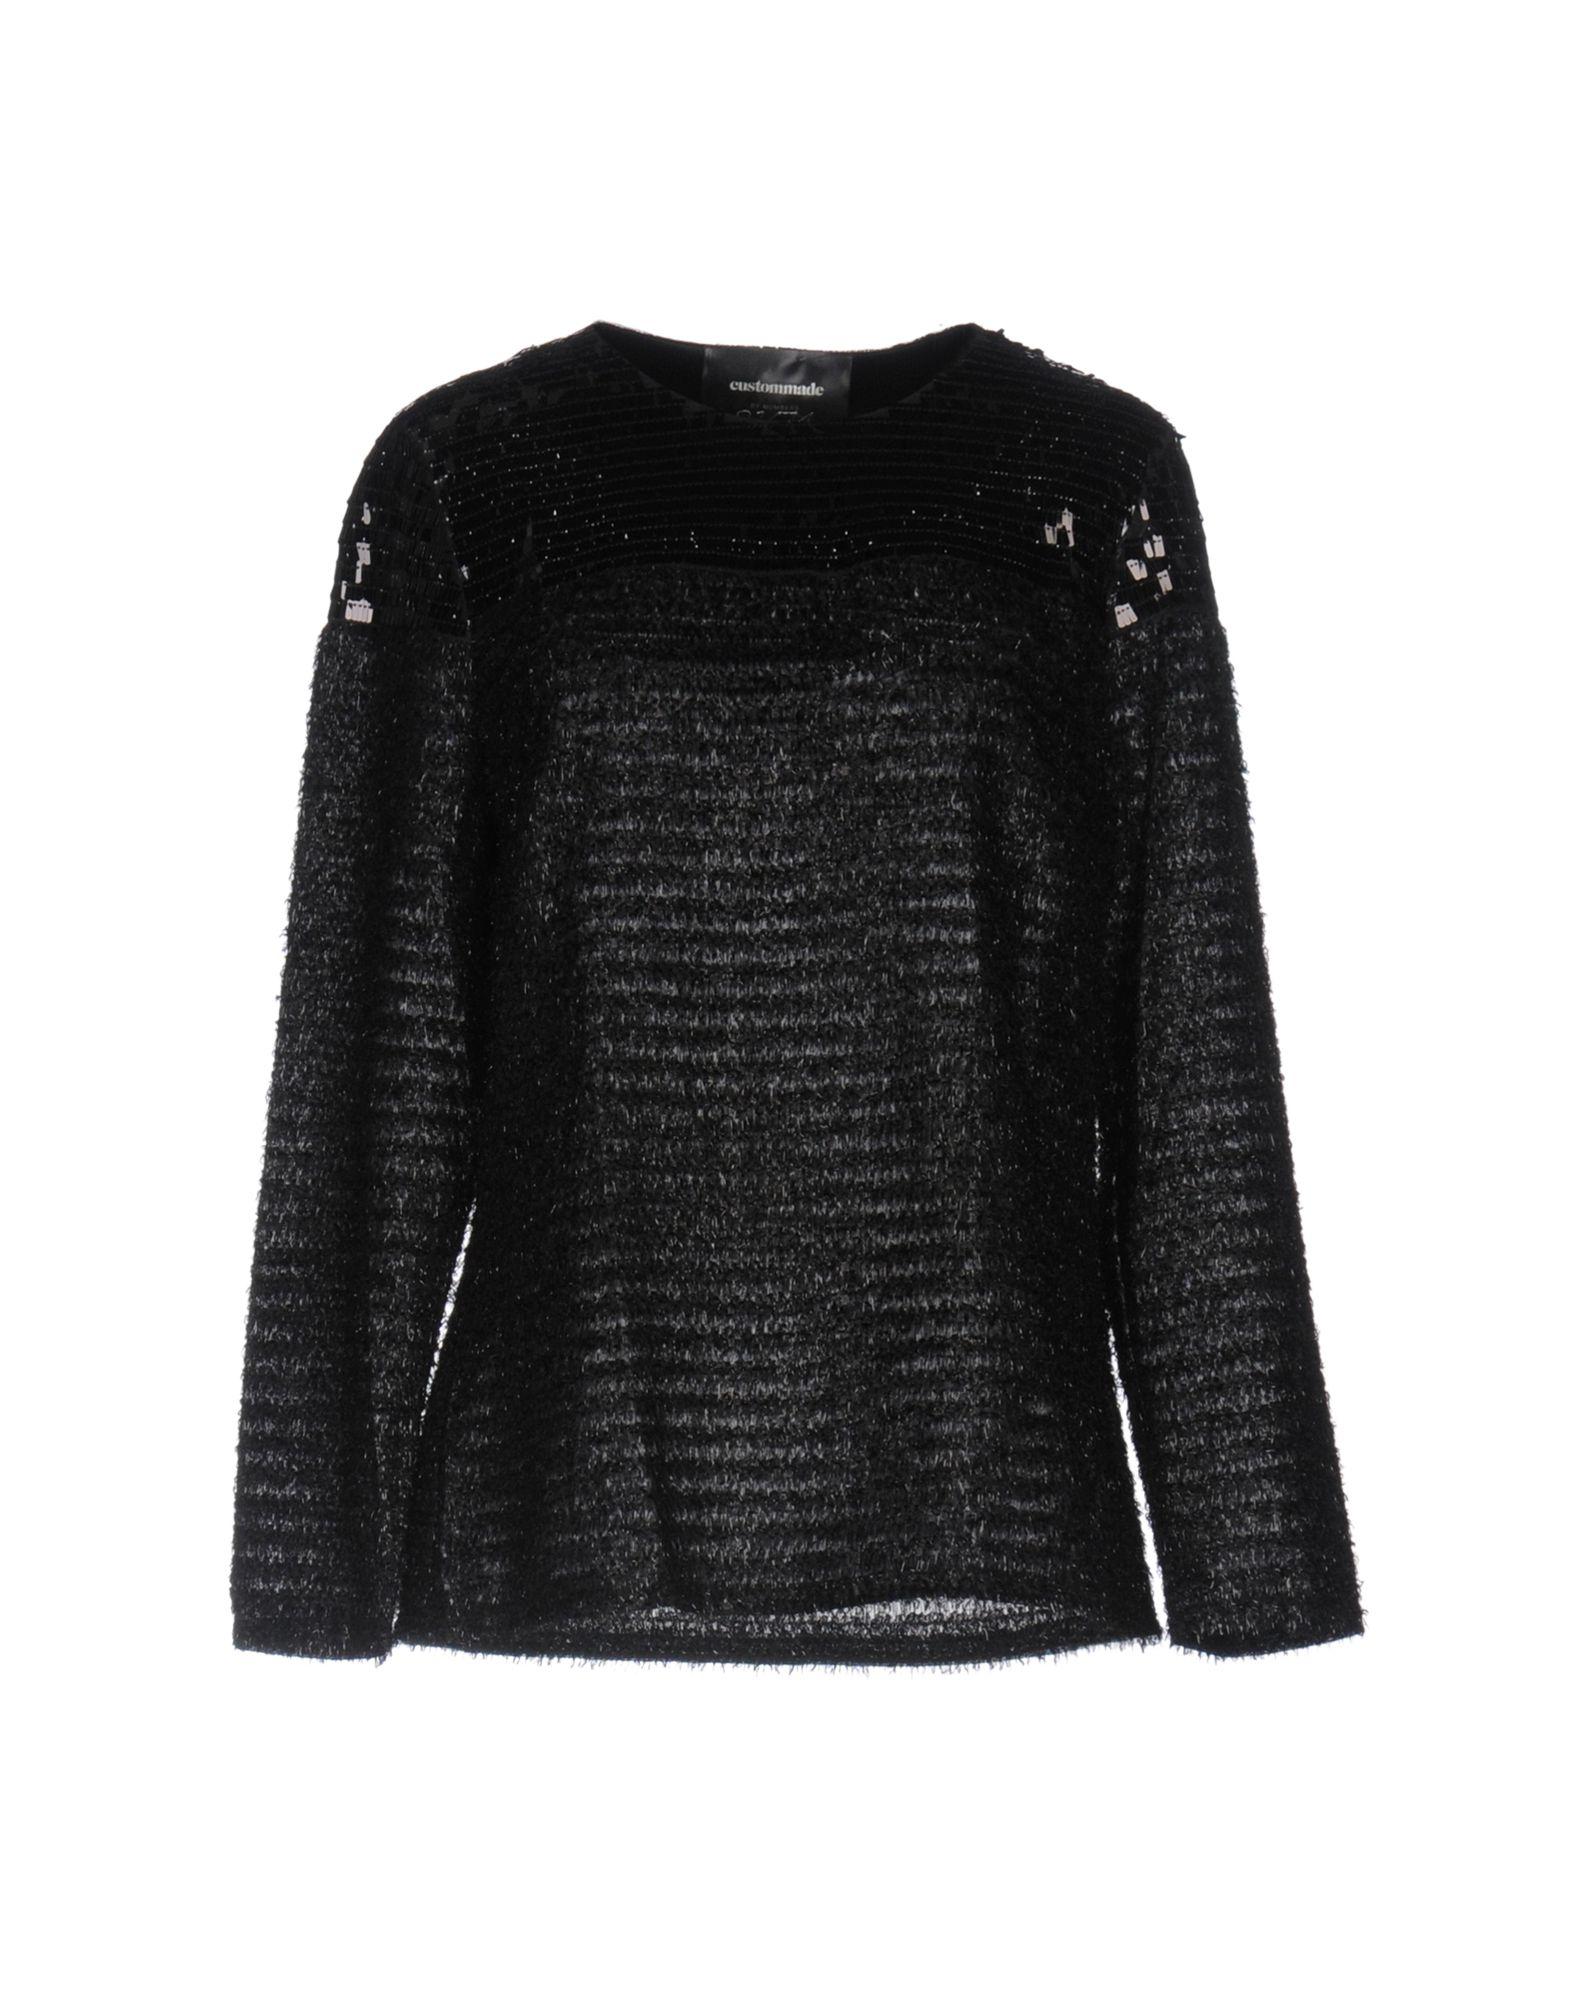 Custommade Blouse Women Custommade Blouses Online On Yoox United